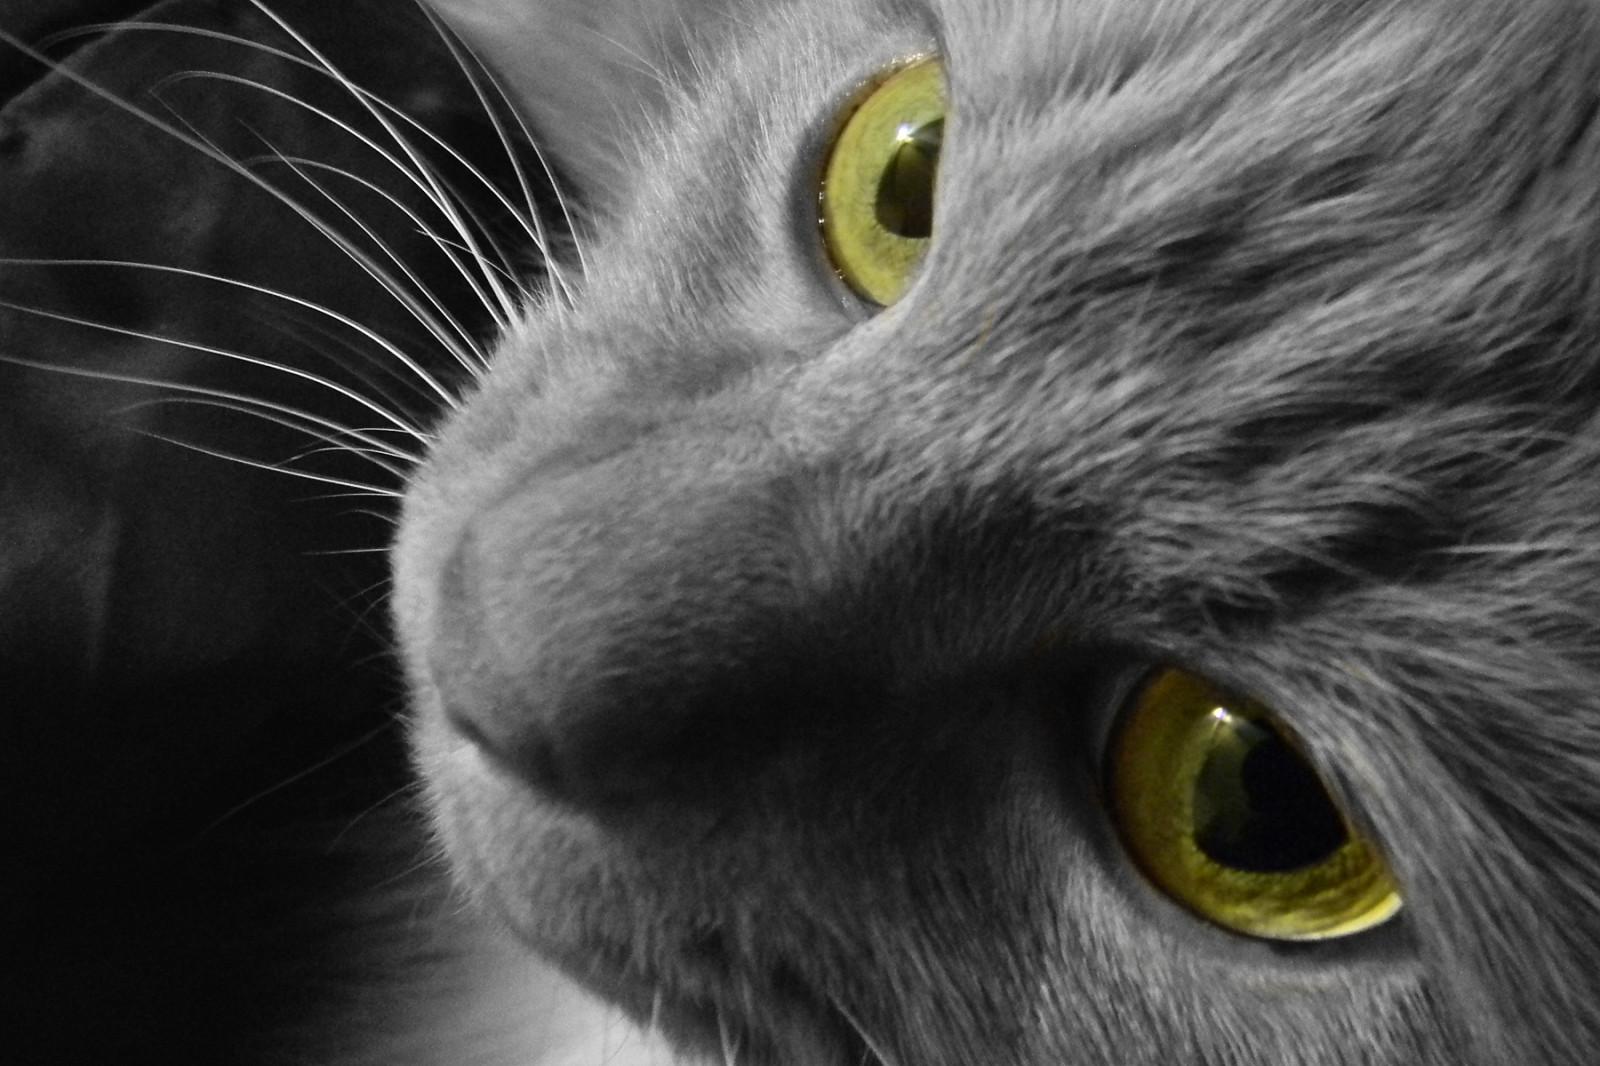 wallpaper eyes yellow hair nose whiskers georgia black cat blackandwhite 50mm animal. Black Bedroom Furniture Sets. Home Design Ideas